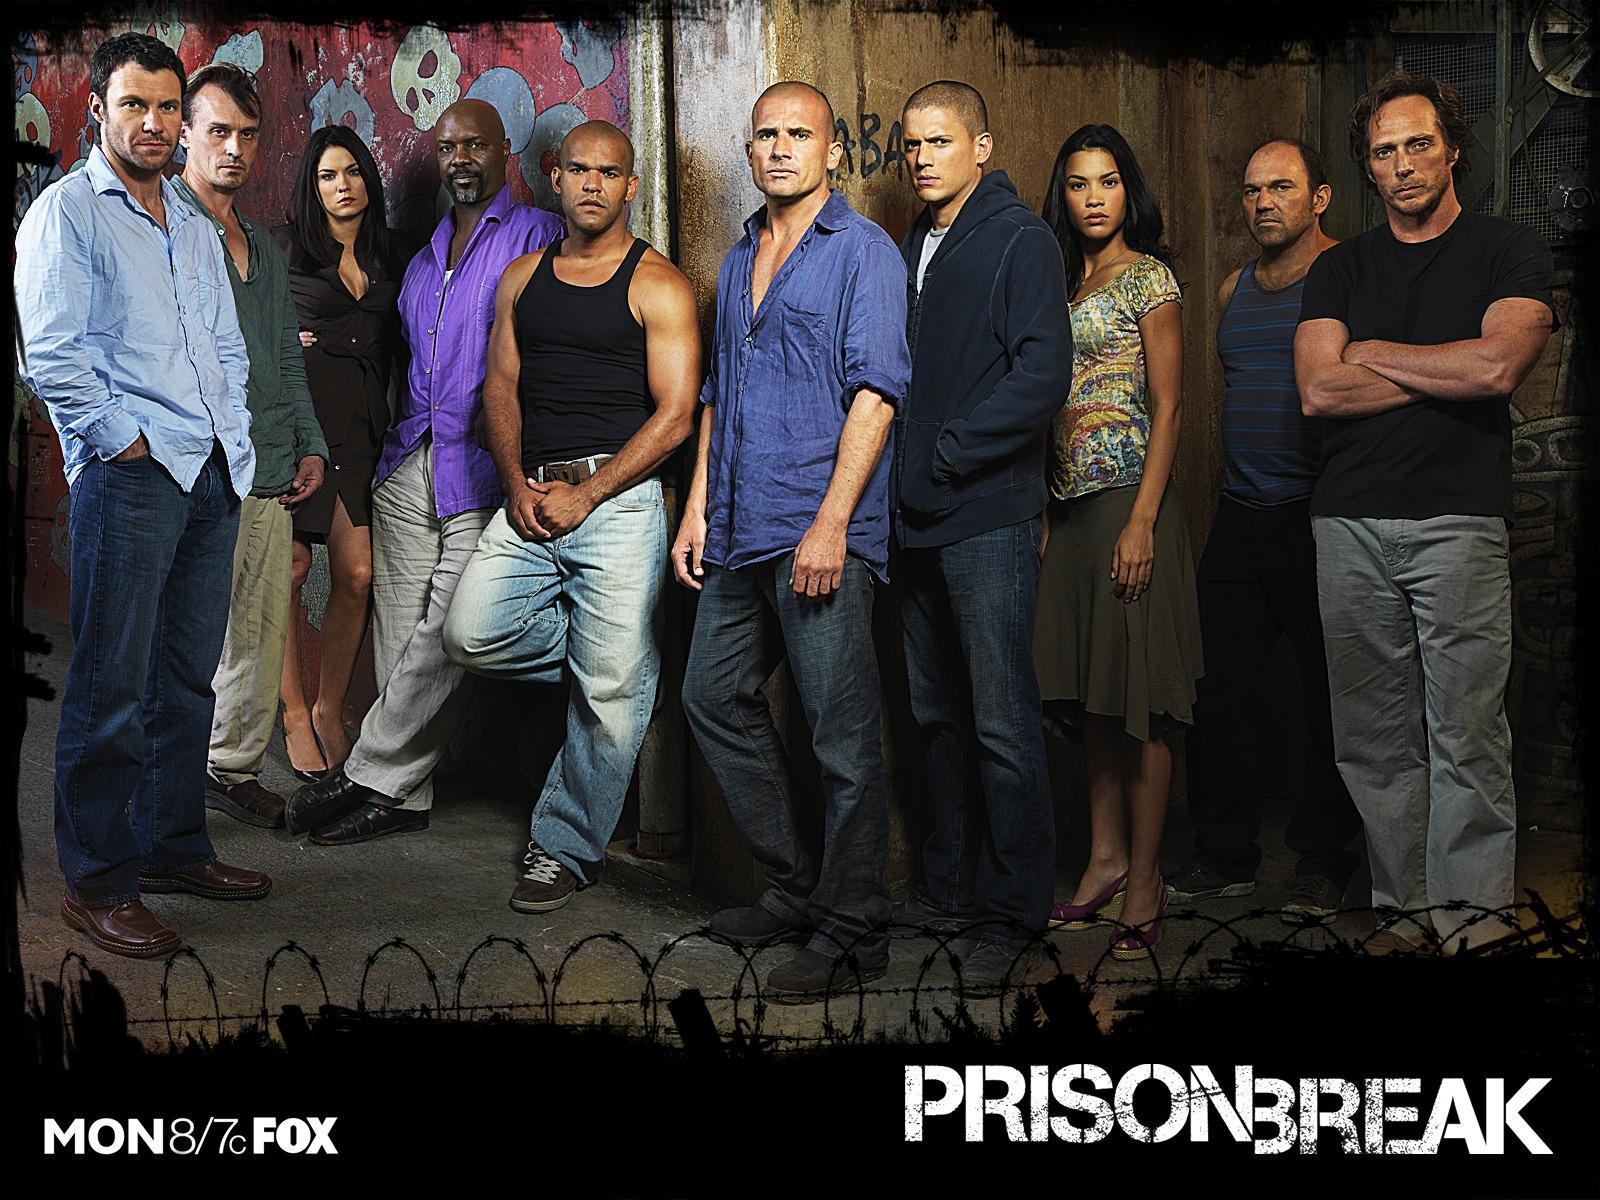 https://muhammadaanxfarhan.files.wordpress.com/2010/03/prison-break-season-3-prison-break-699632_1600_1200.jpg